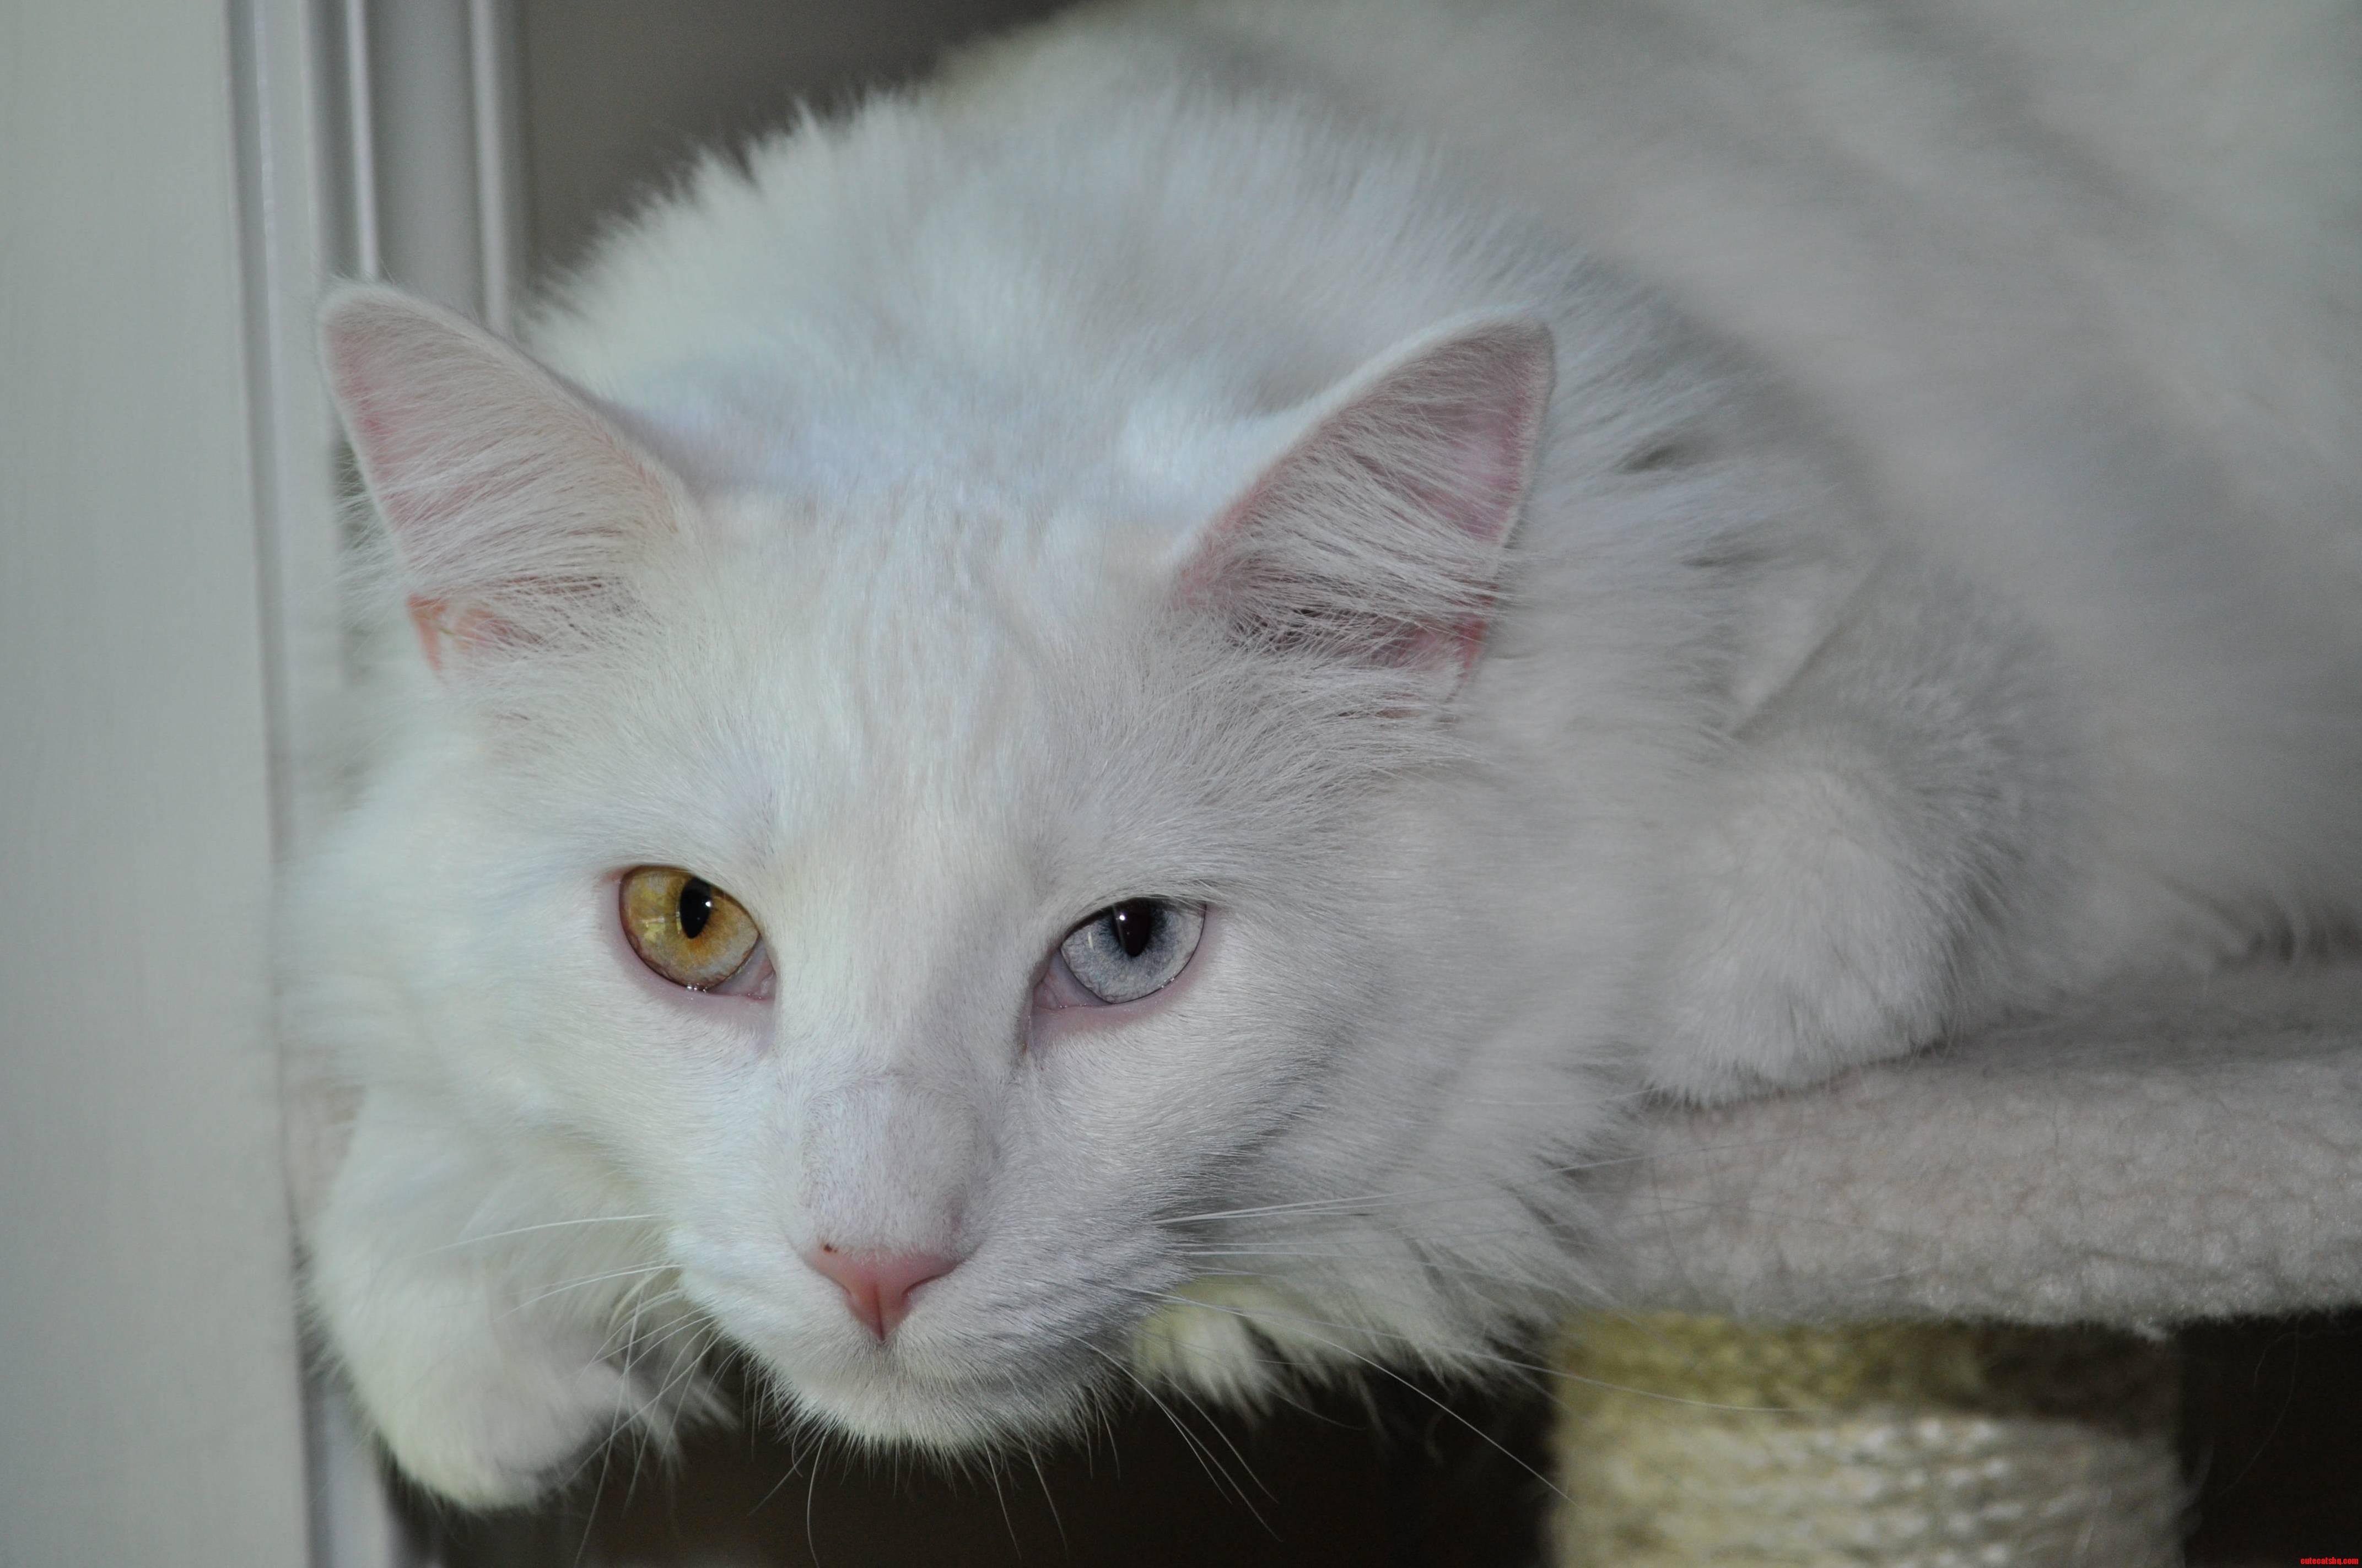 My handsome kitty with heterochromia